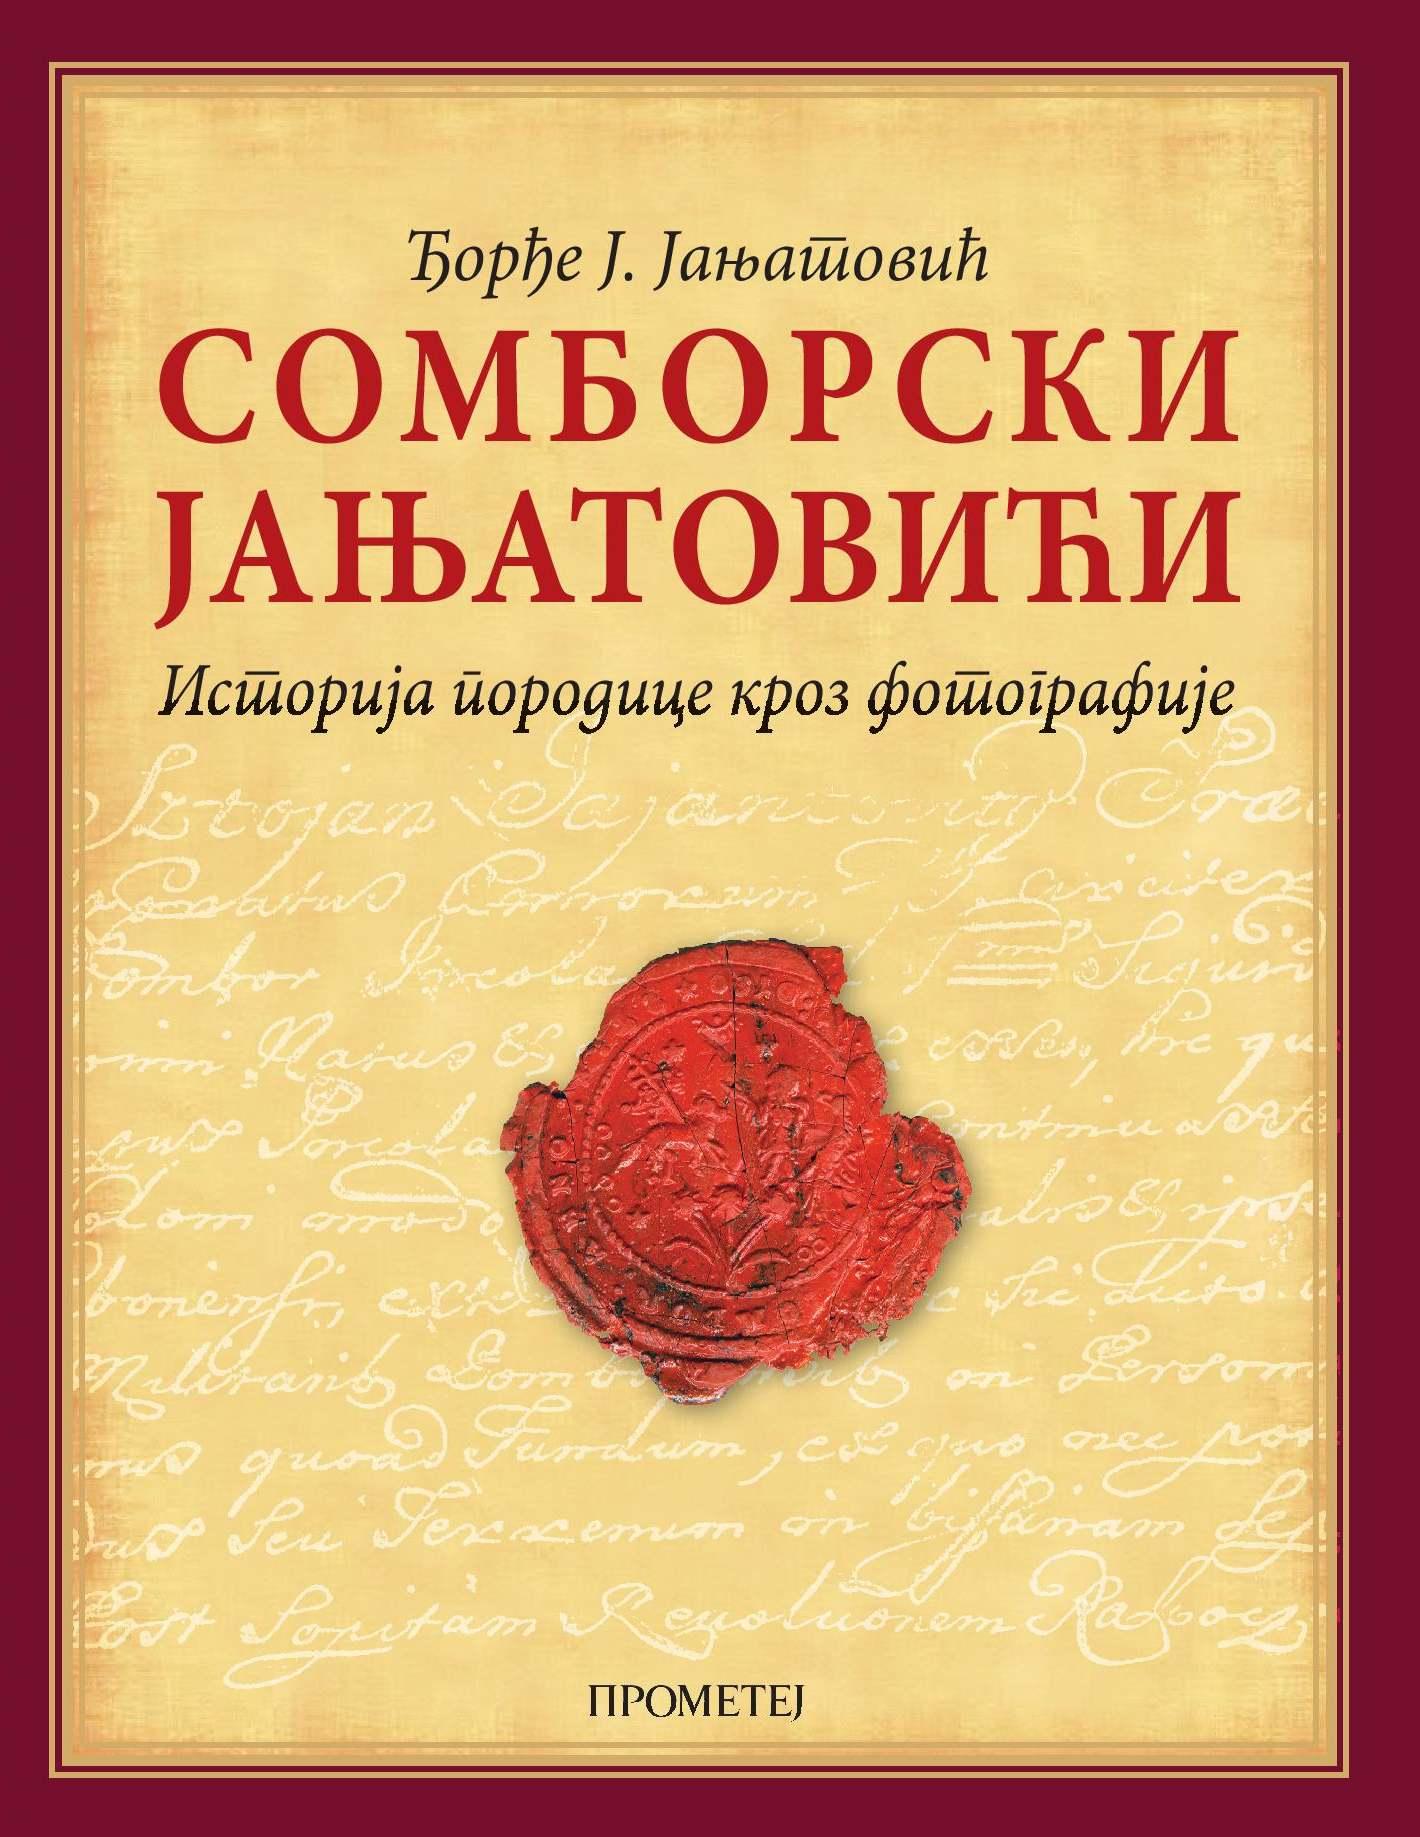 Сомборски Јањатовићи – Историја породице кроз фотографије